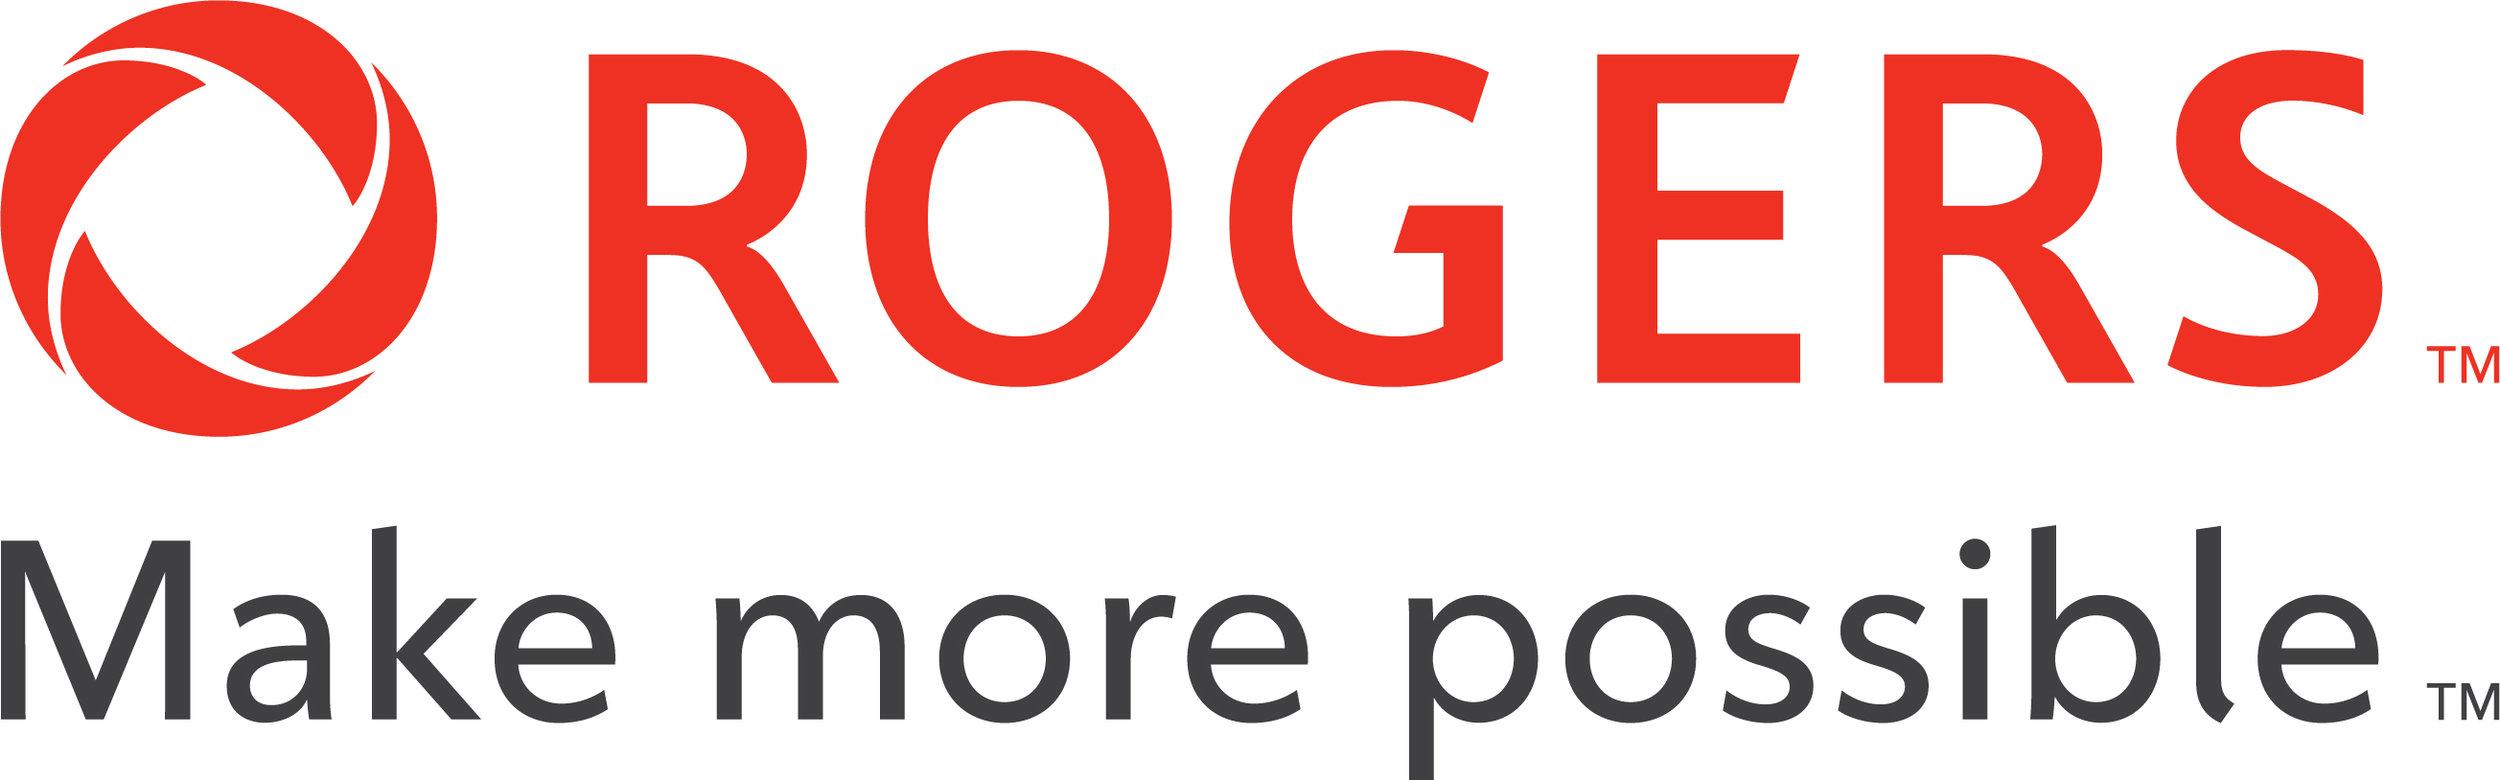 Rogers MMP englishlogo@4x-100.jpg